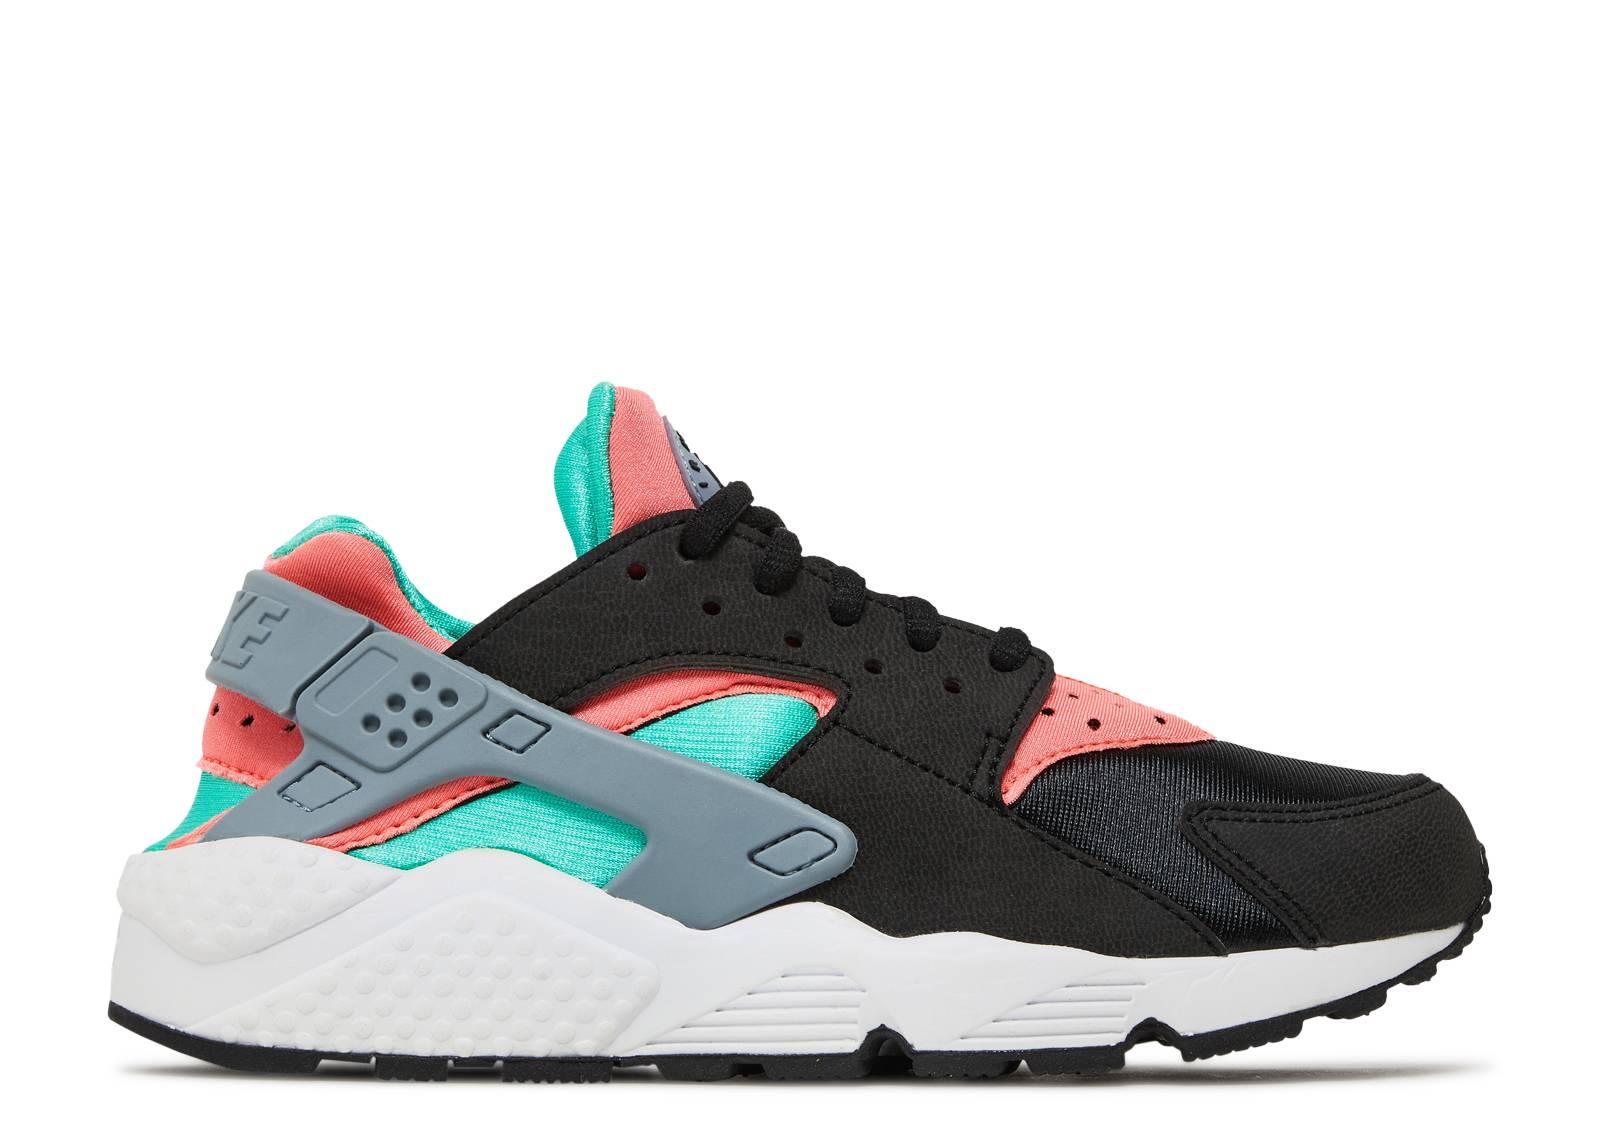 0750b81253f8 W s Air Huarache Run - Nike - 634835 003 - black black-menta-hot lava